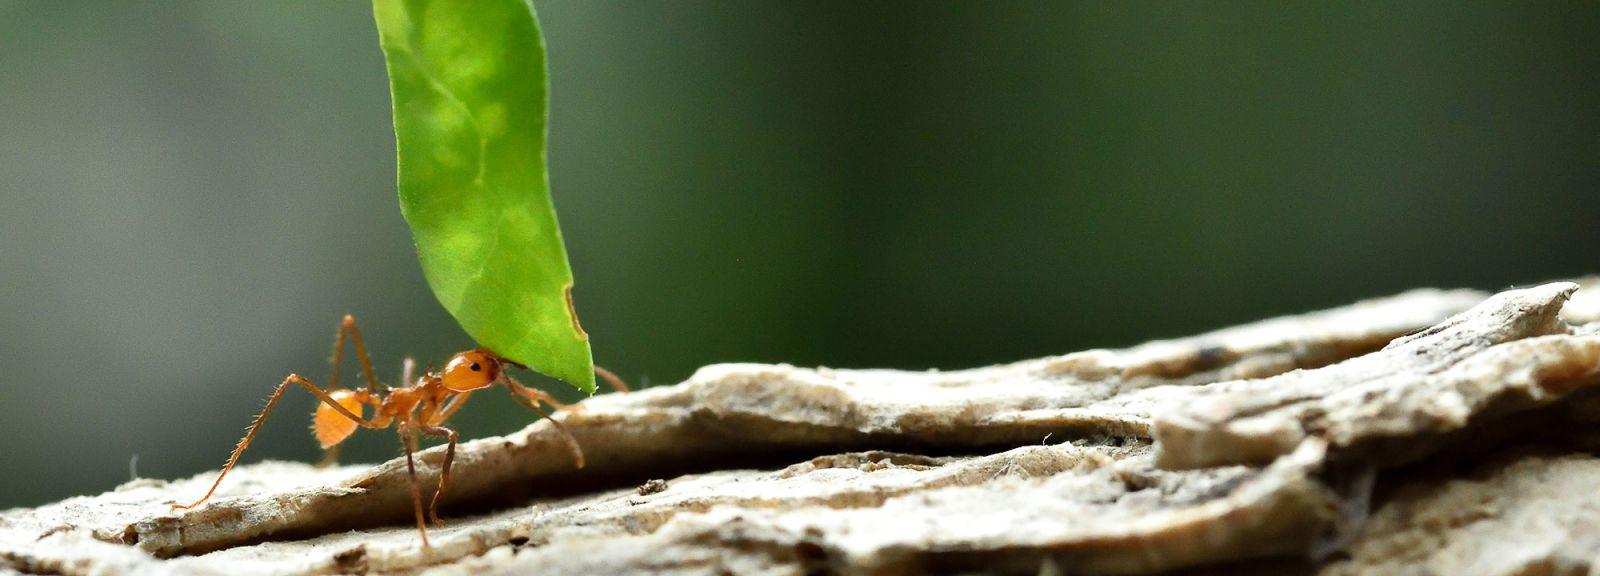 Fourmis Atta © MNHN - F. G Grandin